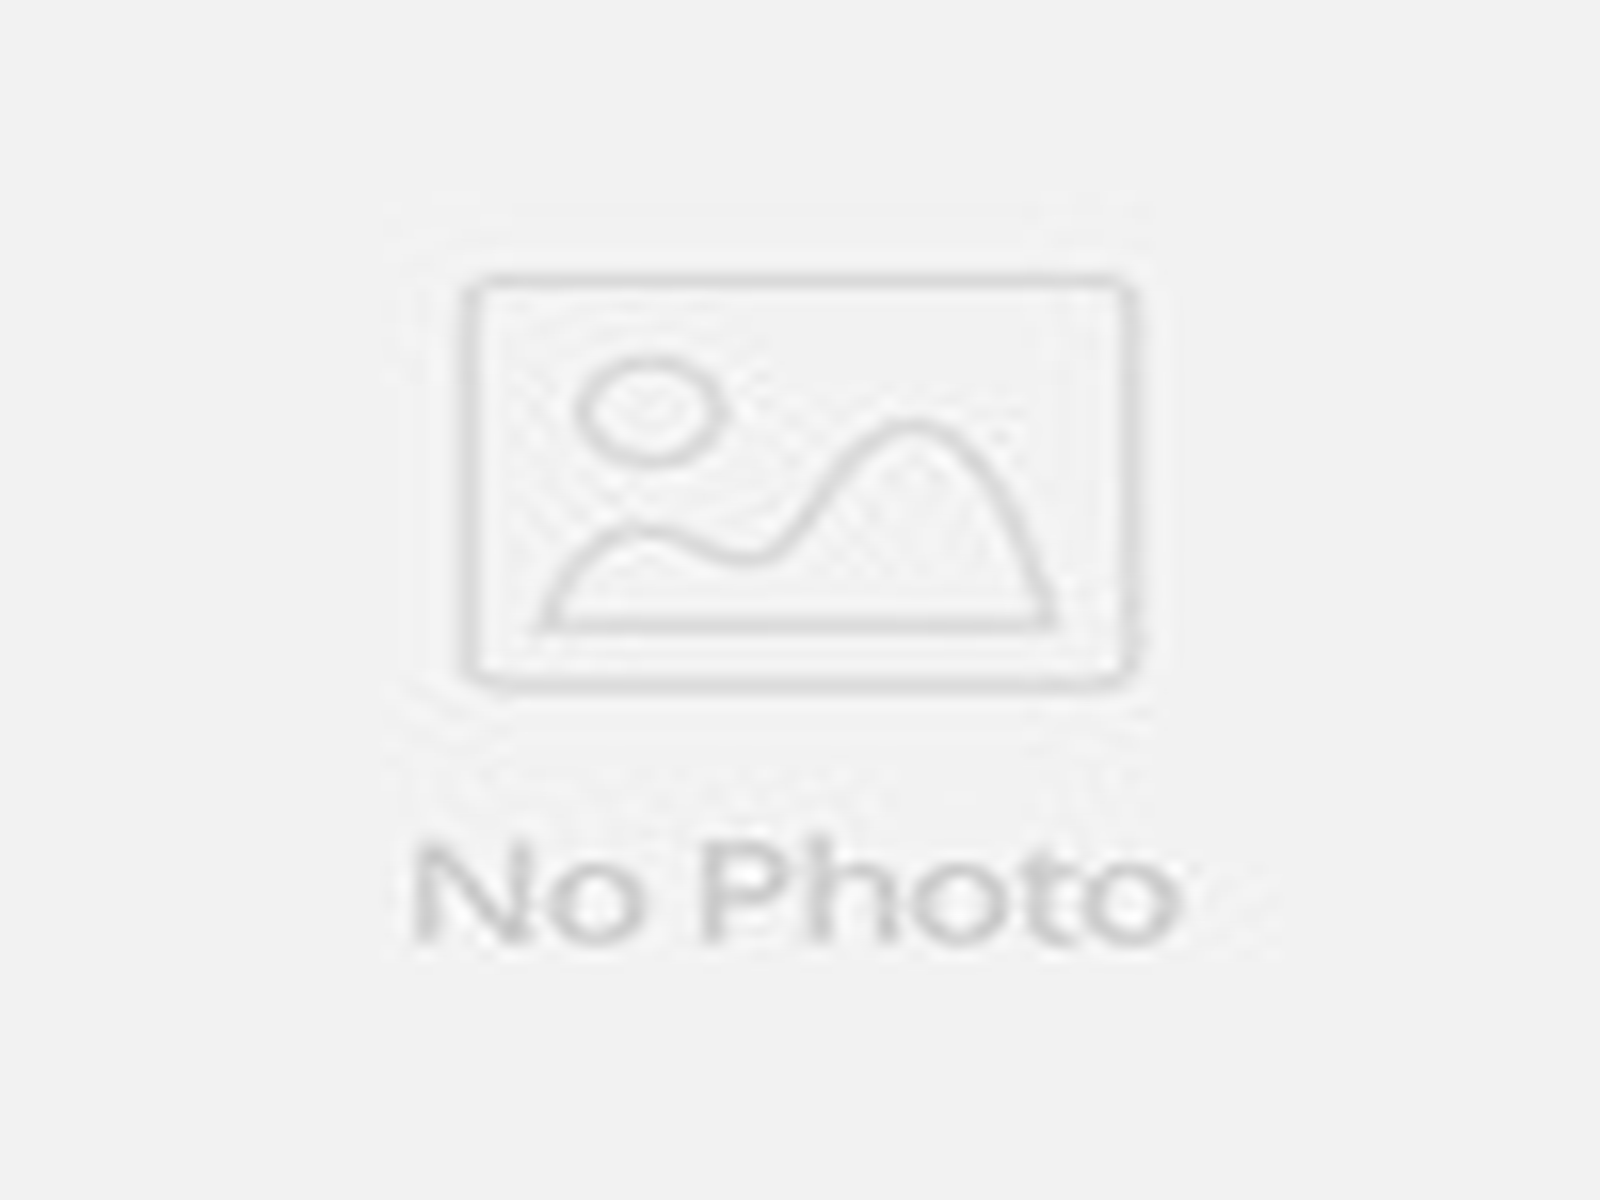 #776E54 Janela de alumínio Windows ID do produto:303956355 portuguese.alibaba  1832 Janela De Aluminio Preço Dicico